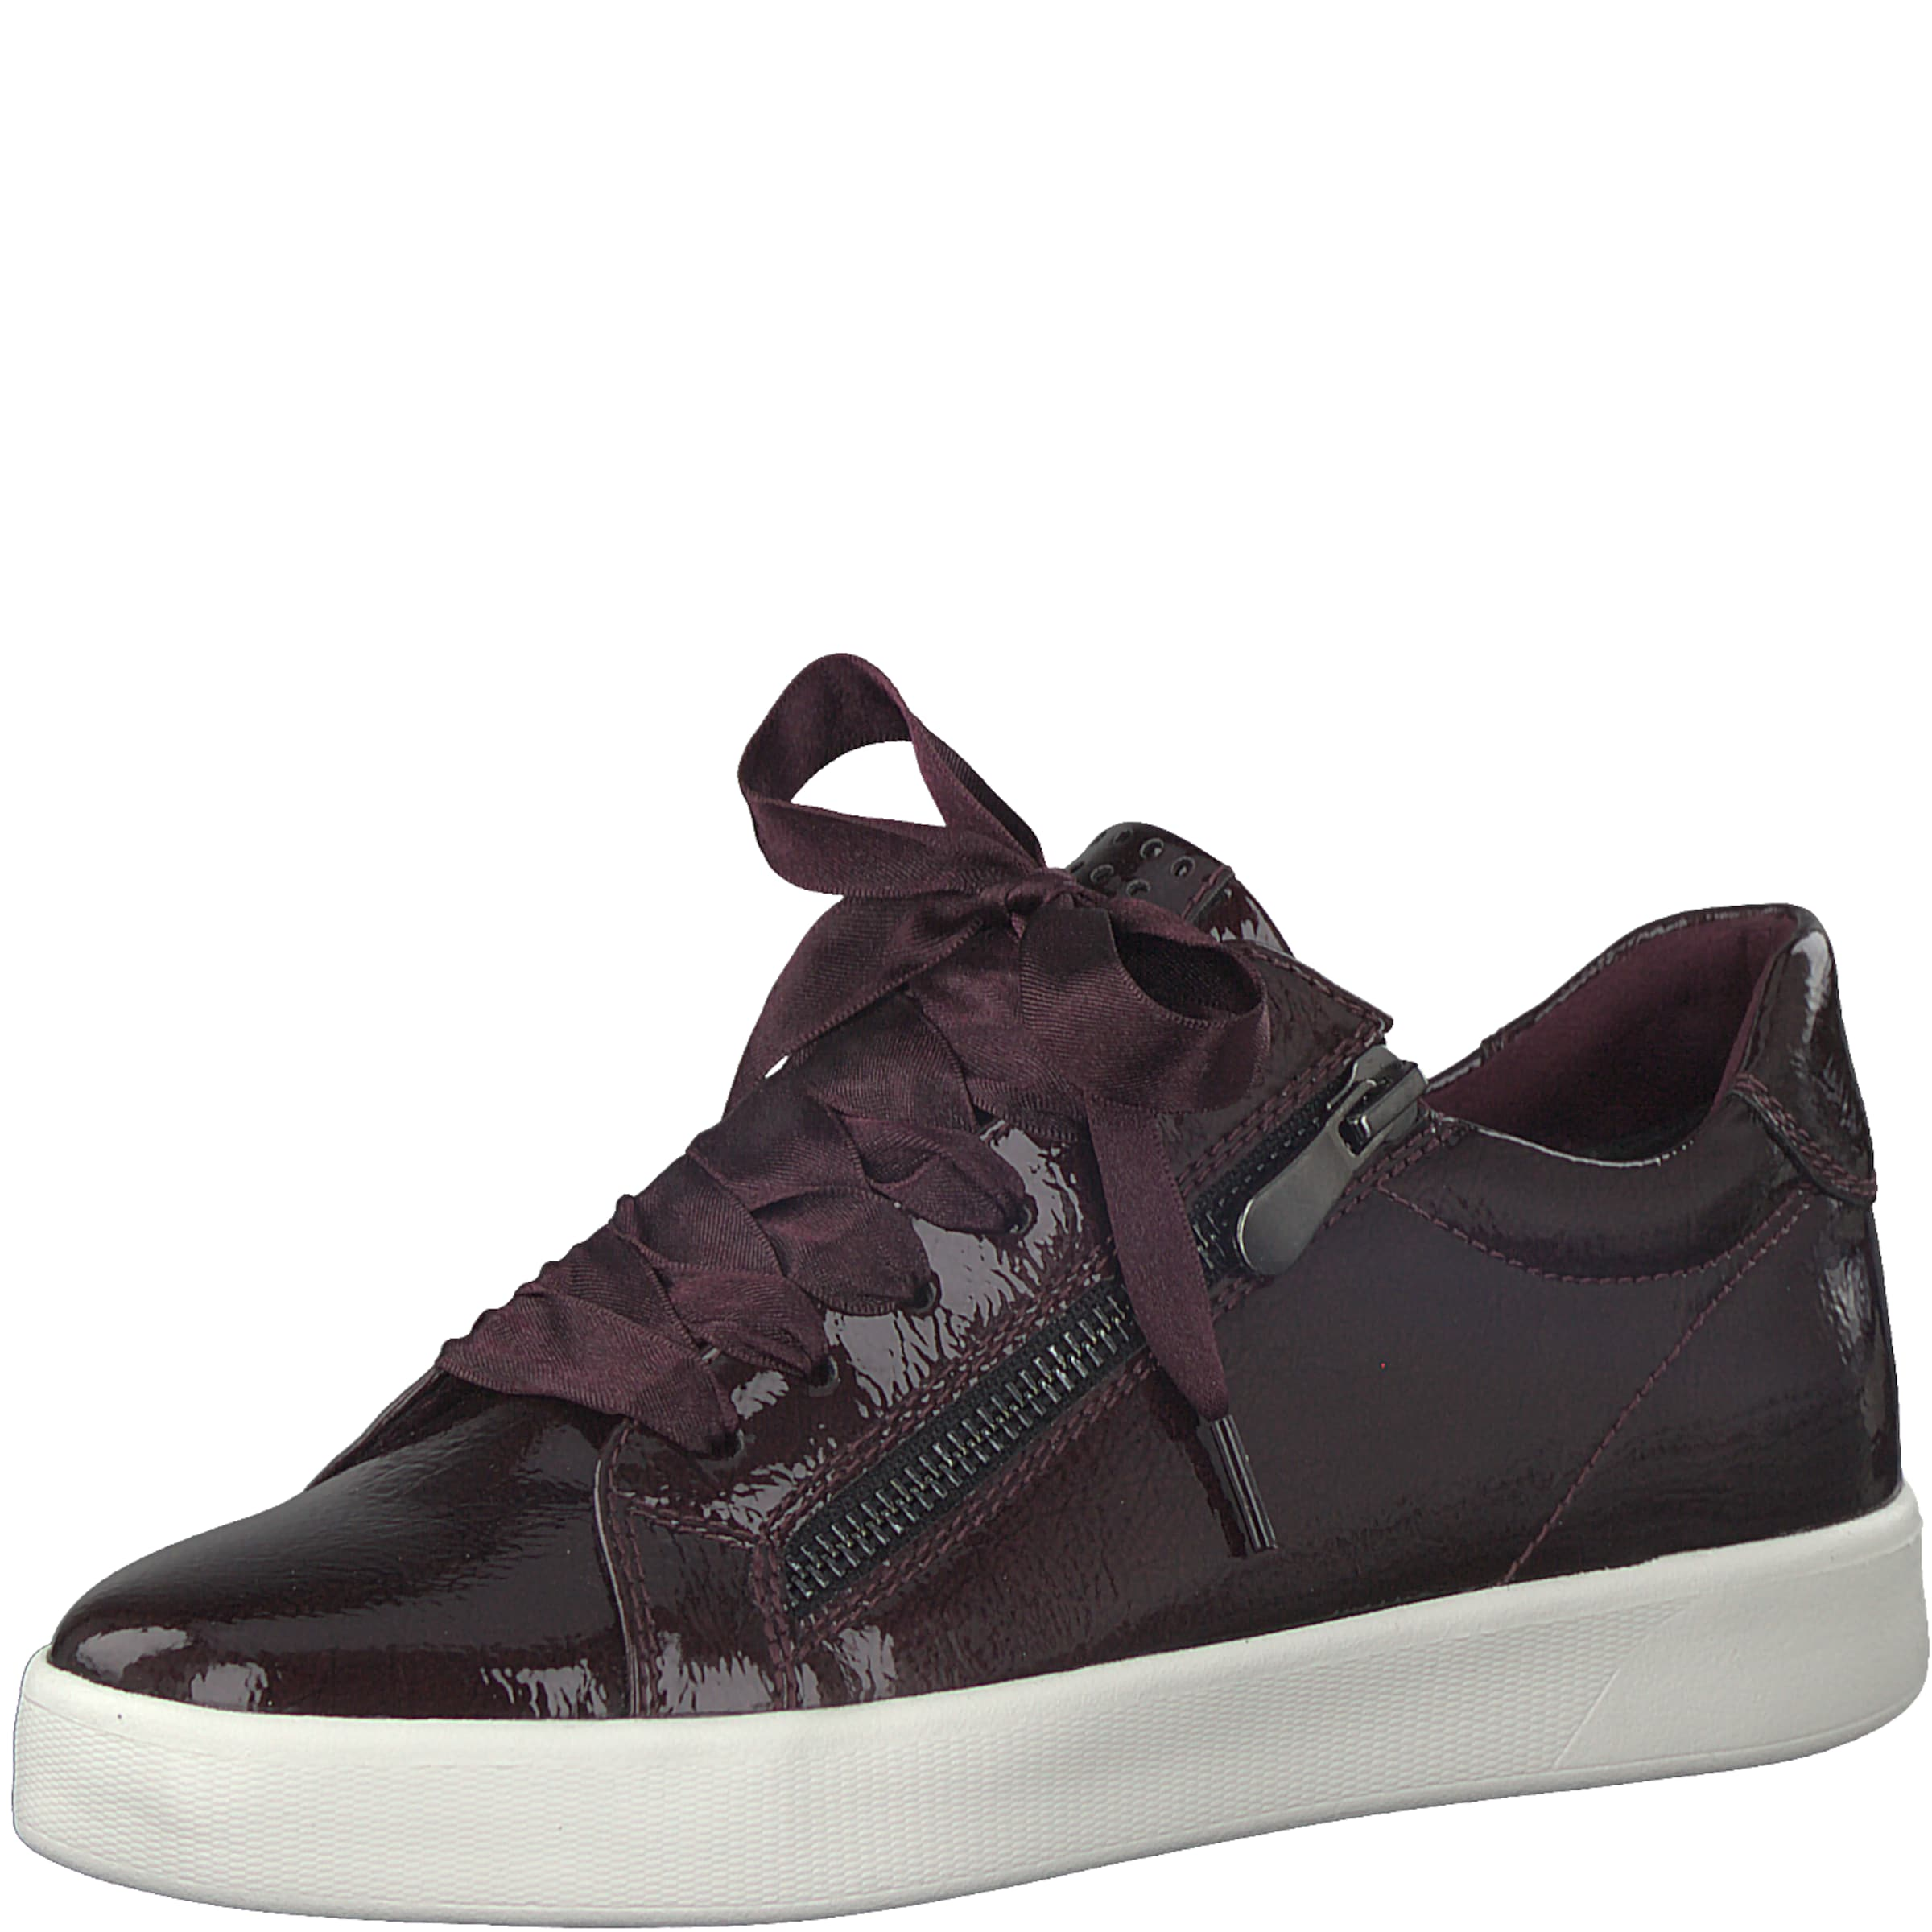 MARCO TOZZI Sneaker low  One colour shiny